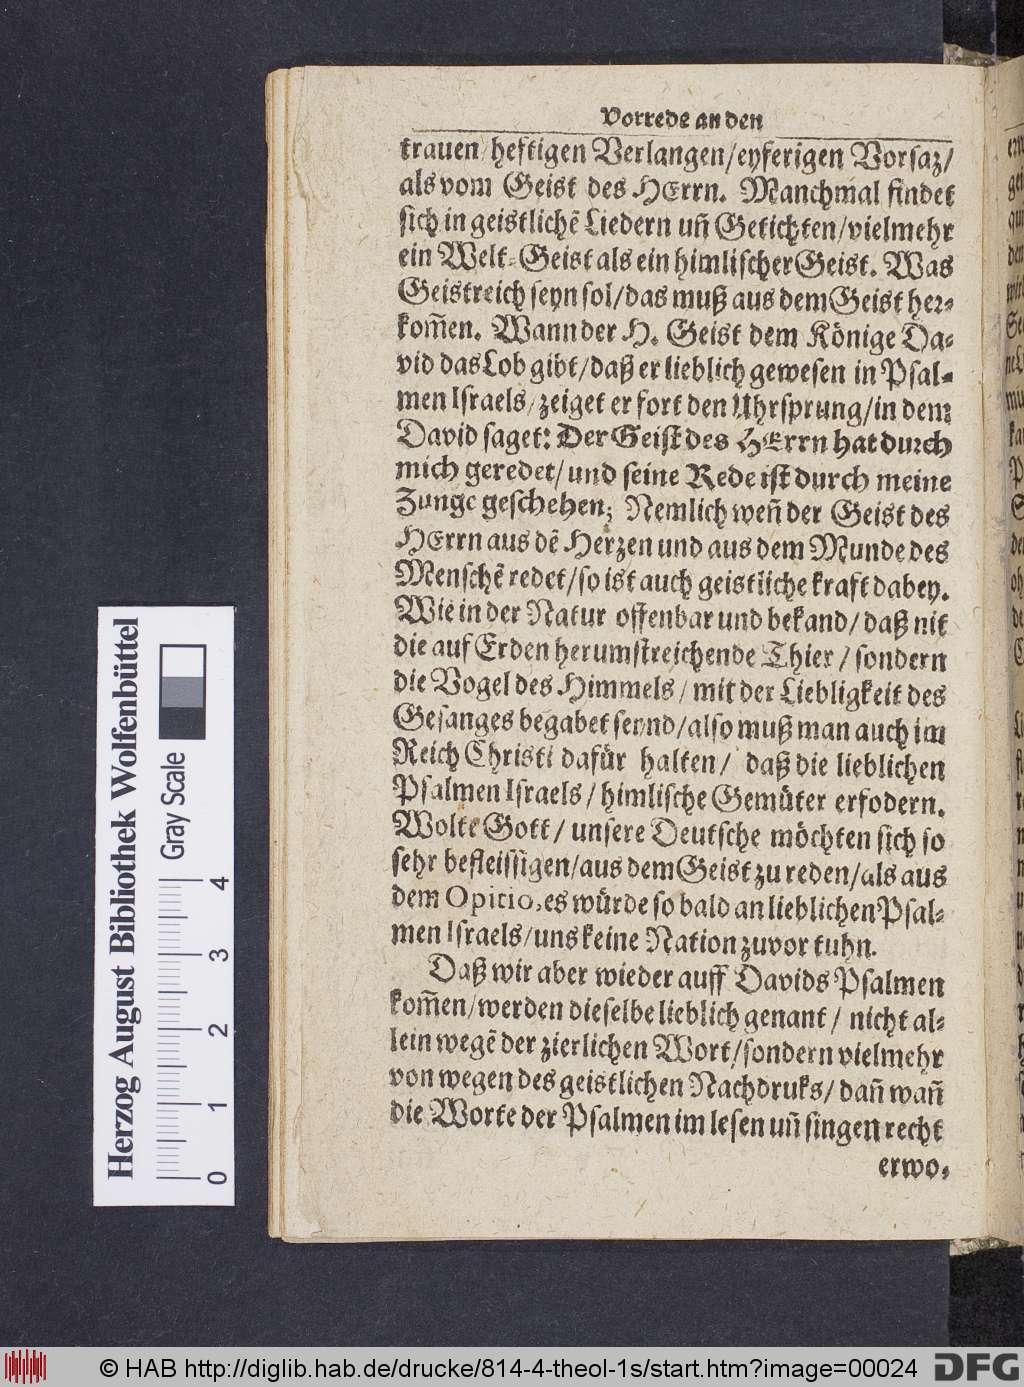 http://diglib.hab.de/drucke/814-4-theol-1s/00024.jpg